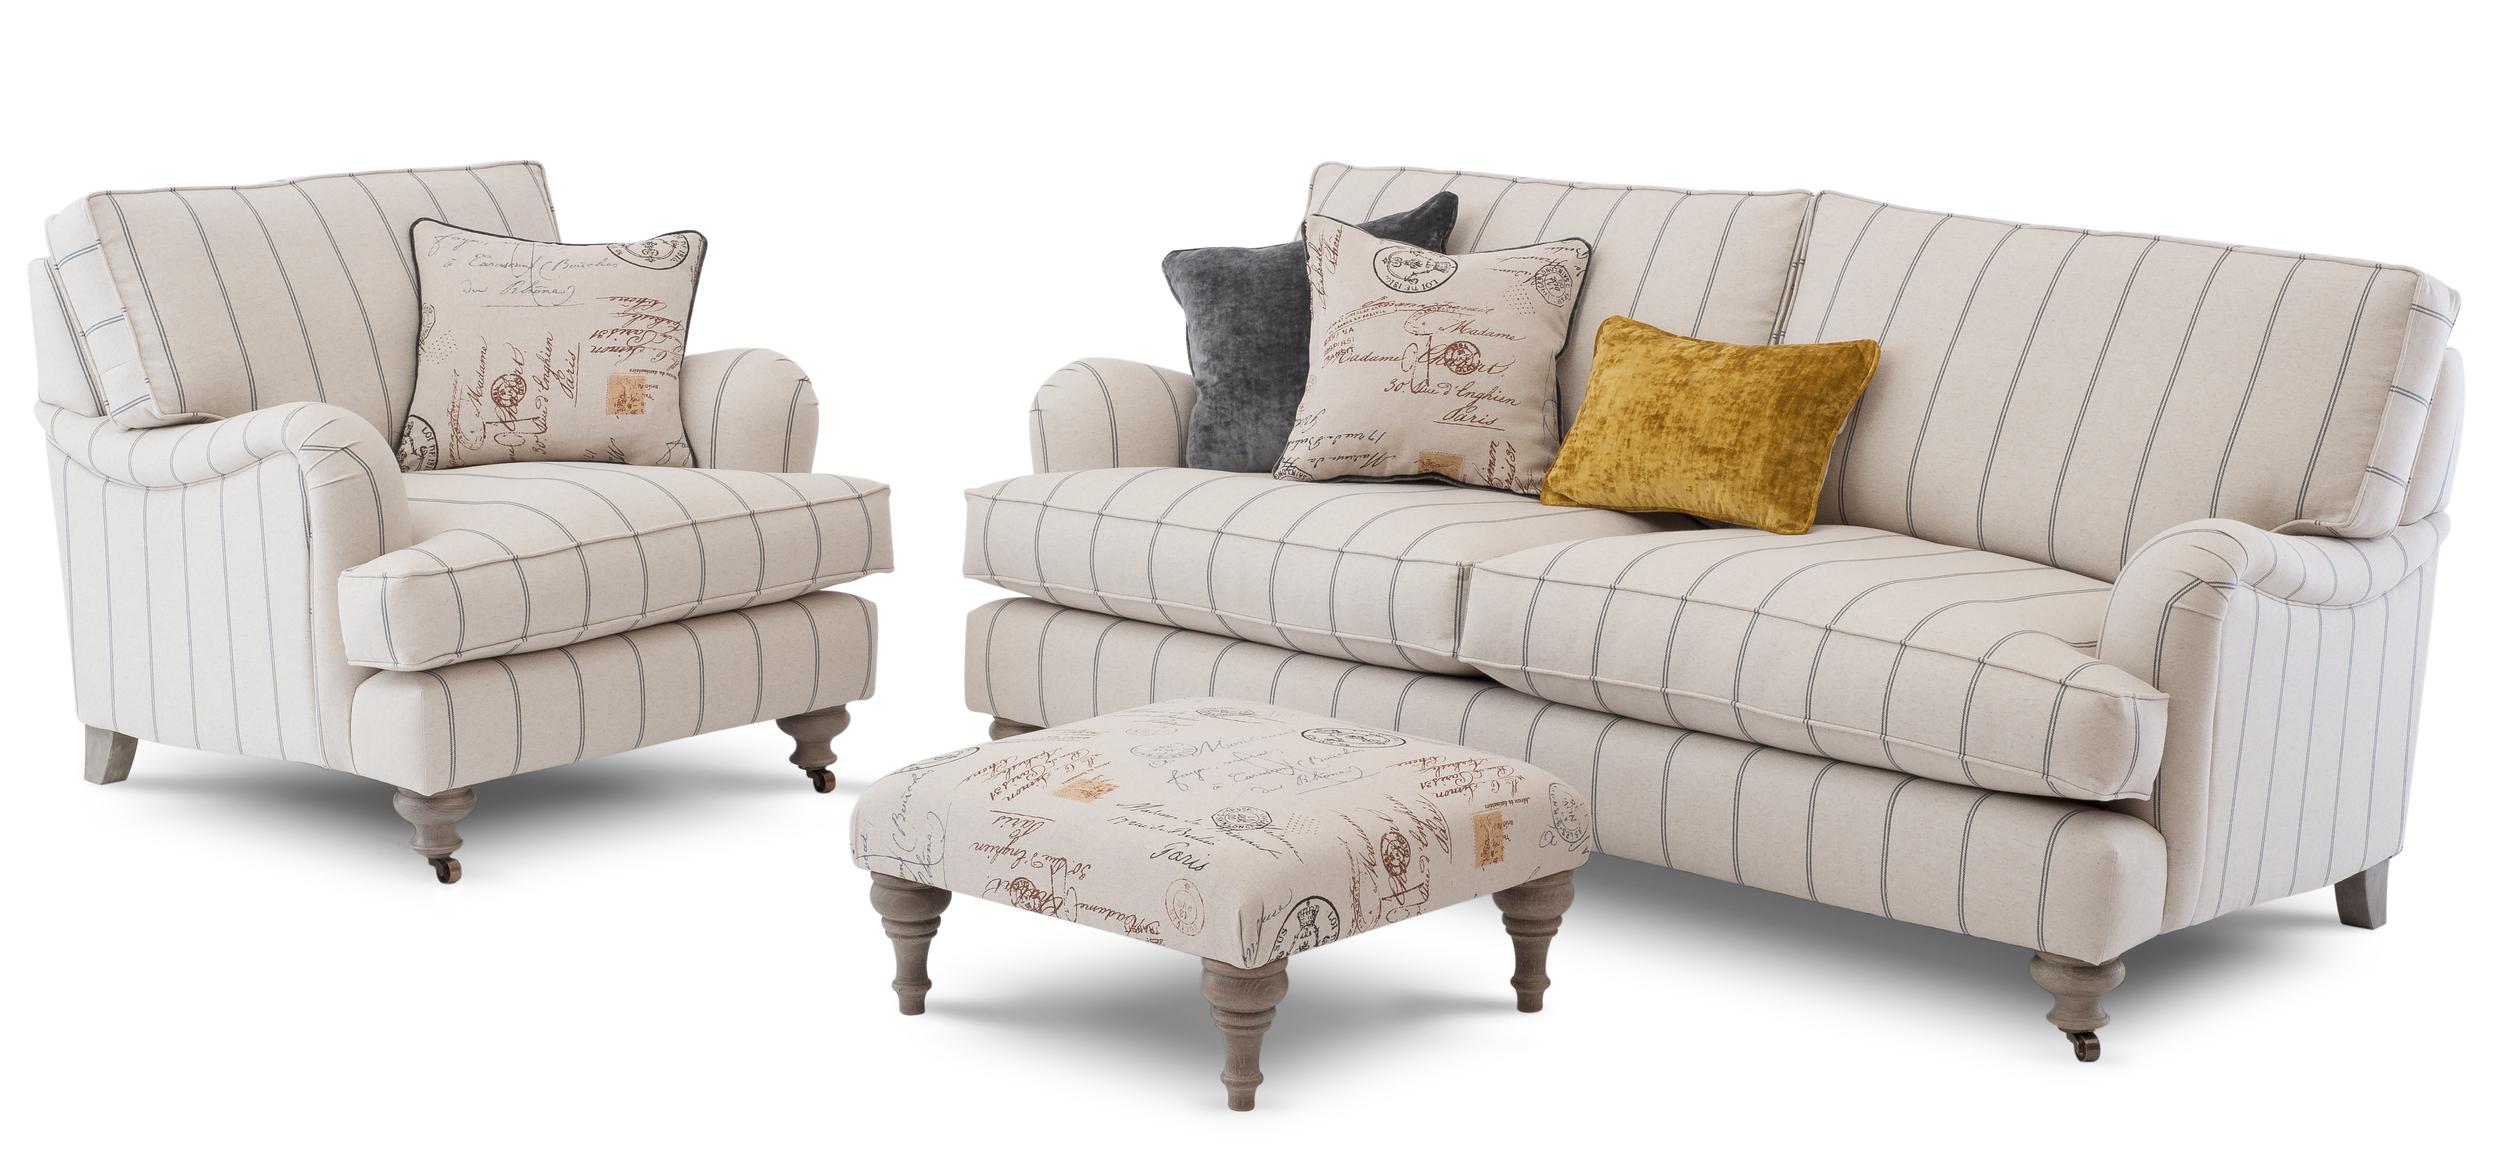 Bourne 3st Sofa & Chair & Footstool-84 Stripe removed.jpg